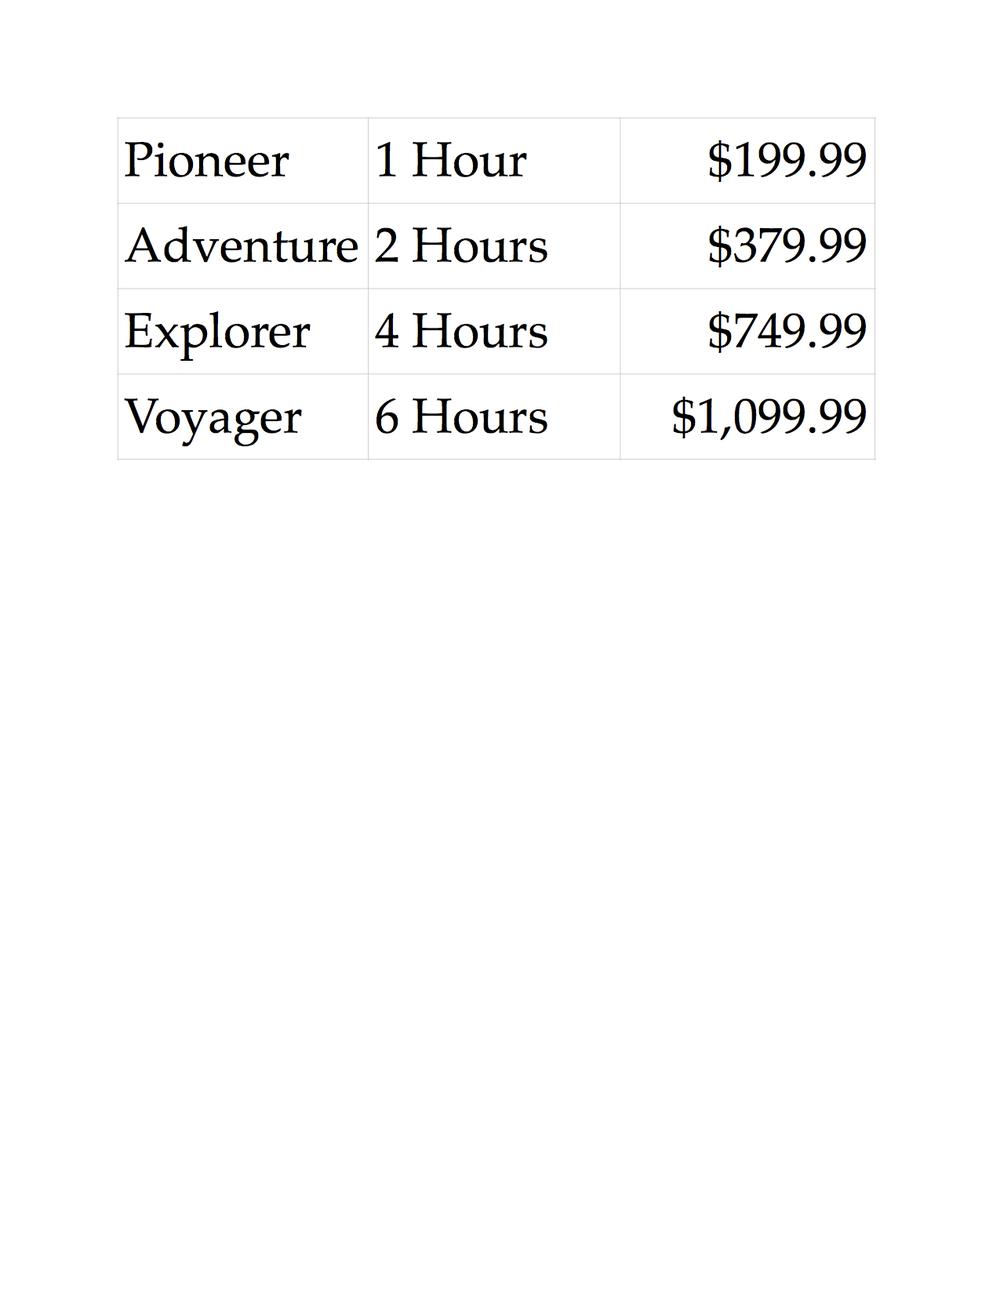 price check.jpg